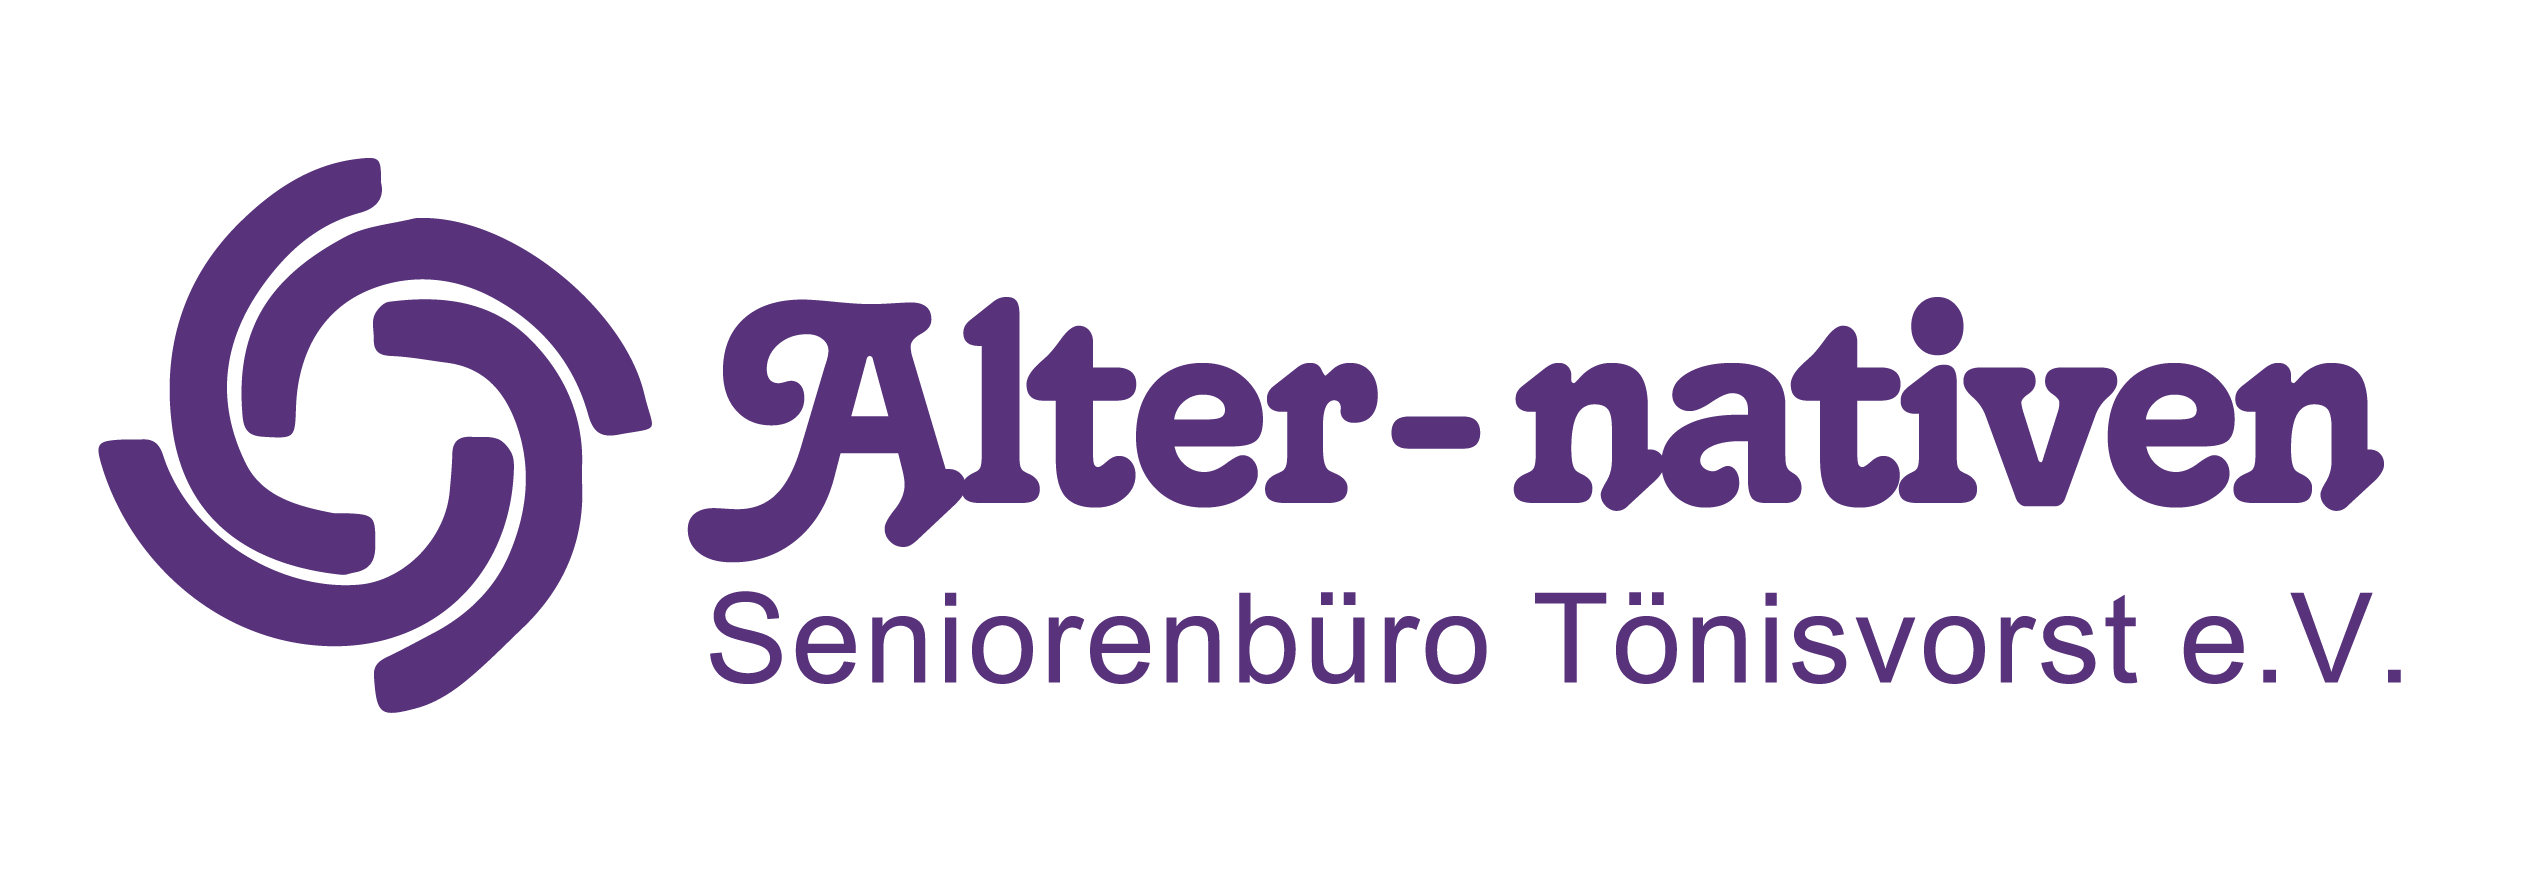 logo_nachbau_lila